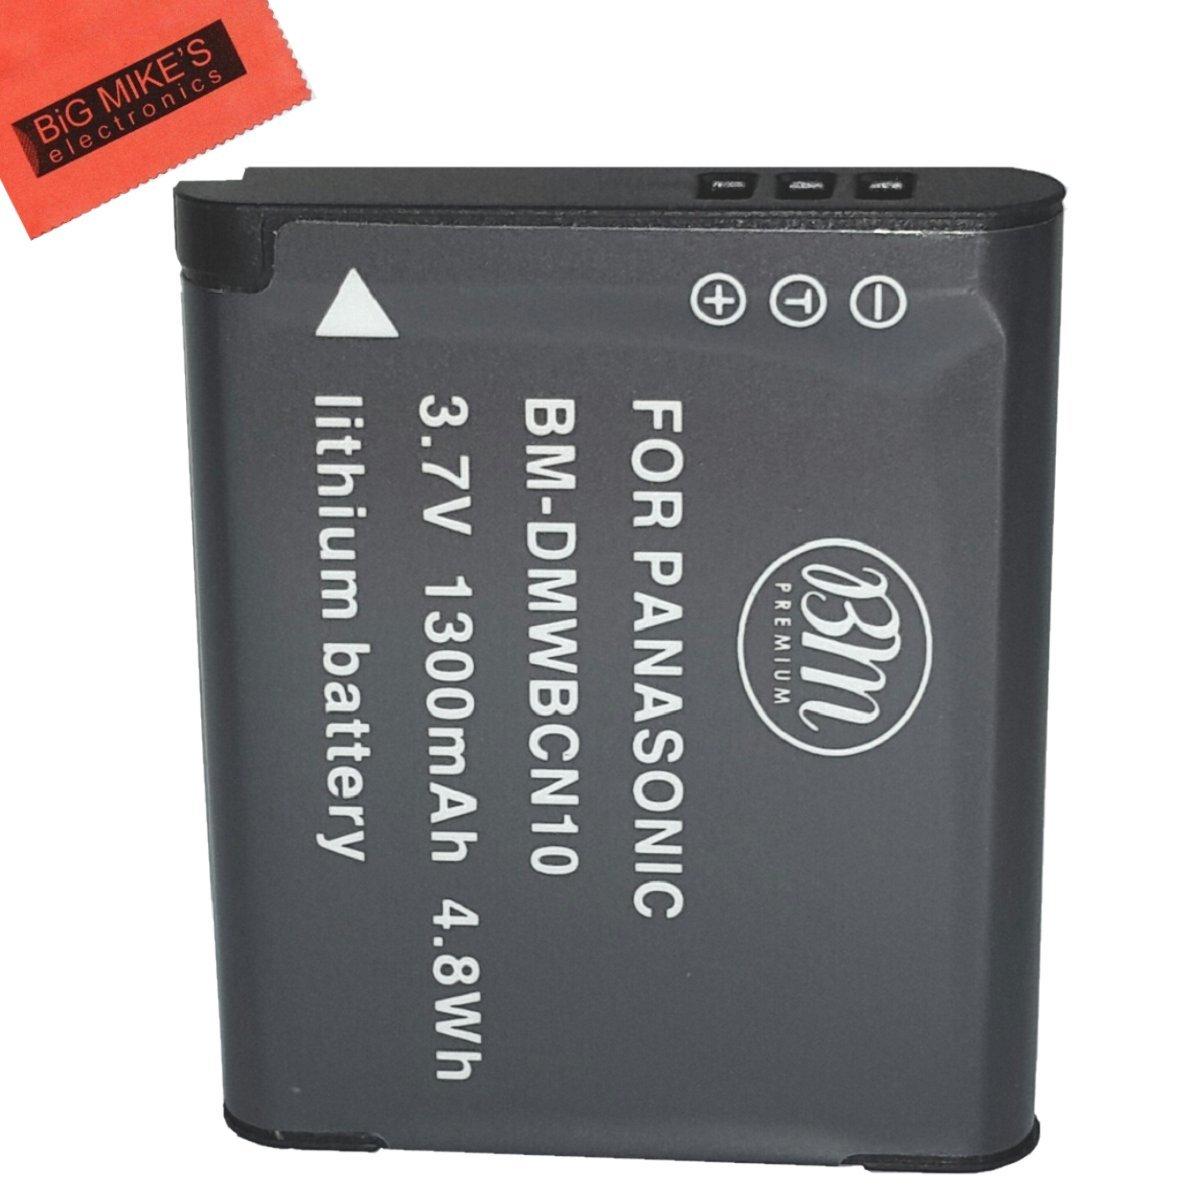 NEW 8Gb Genuine Patriot Memory Card for PANASONIC LUMIX DMC-LZ7 Digital camera